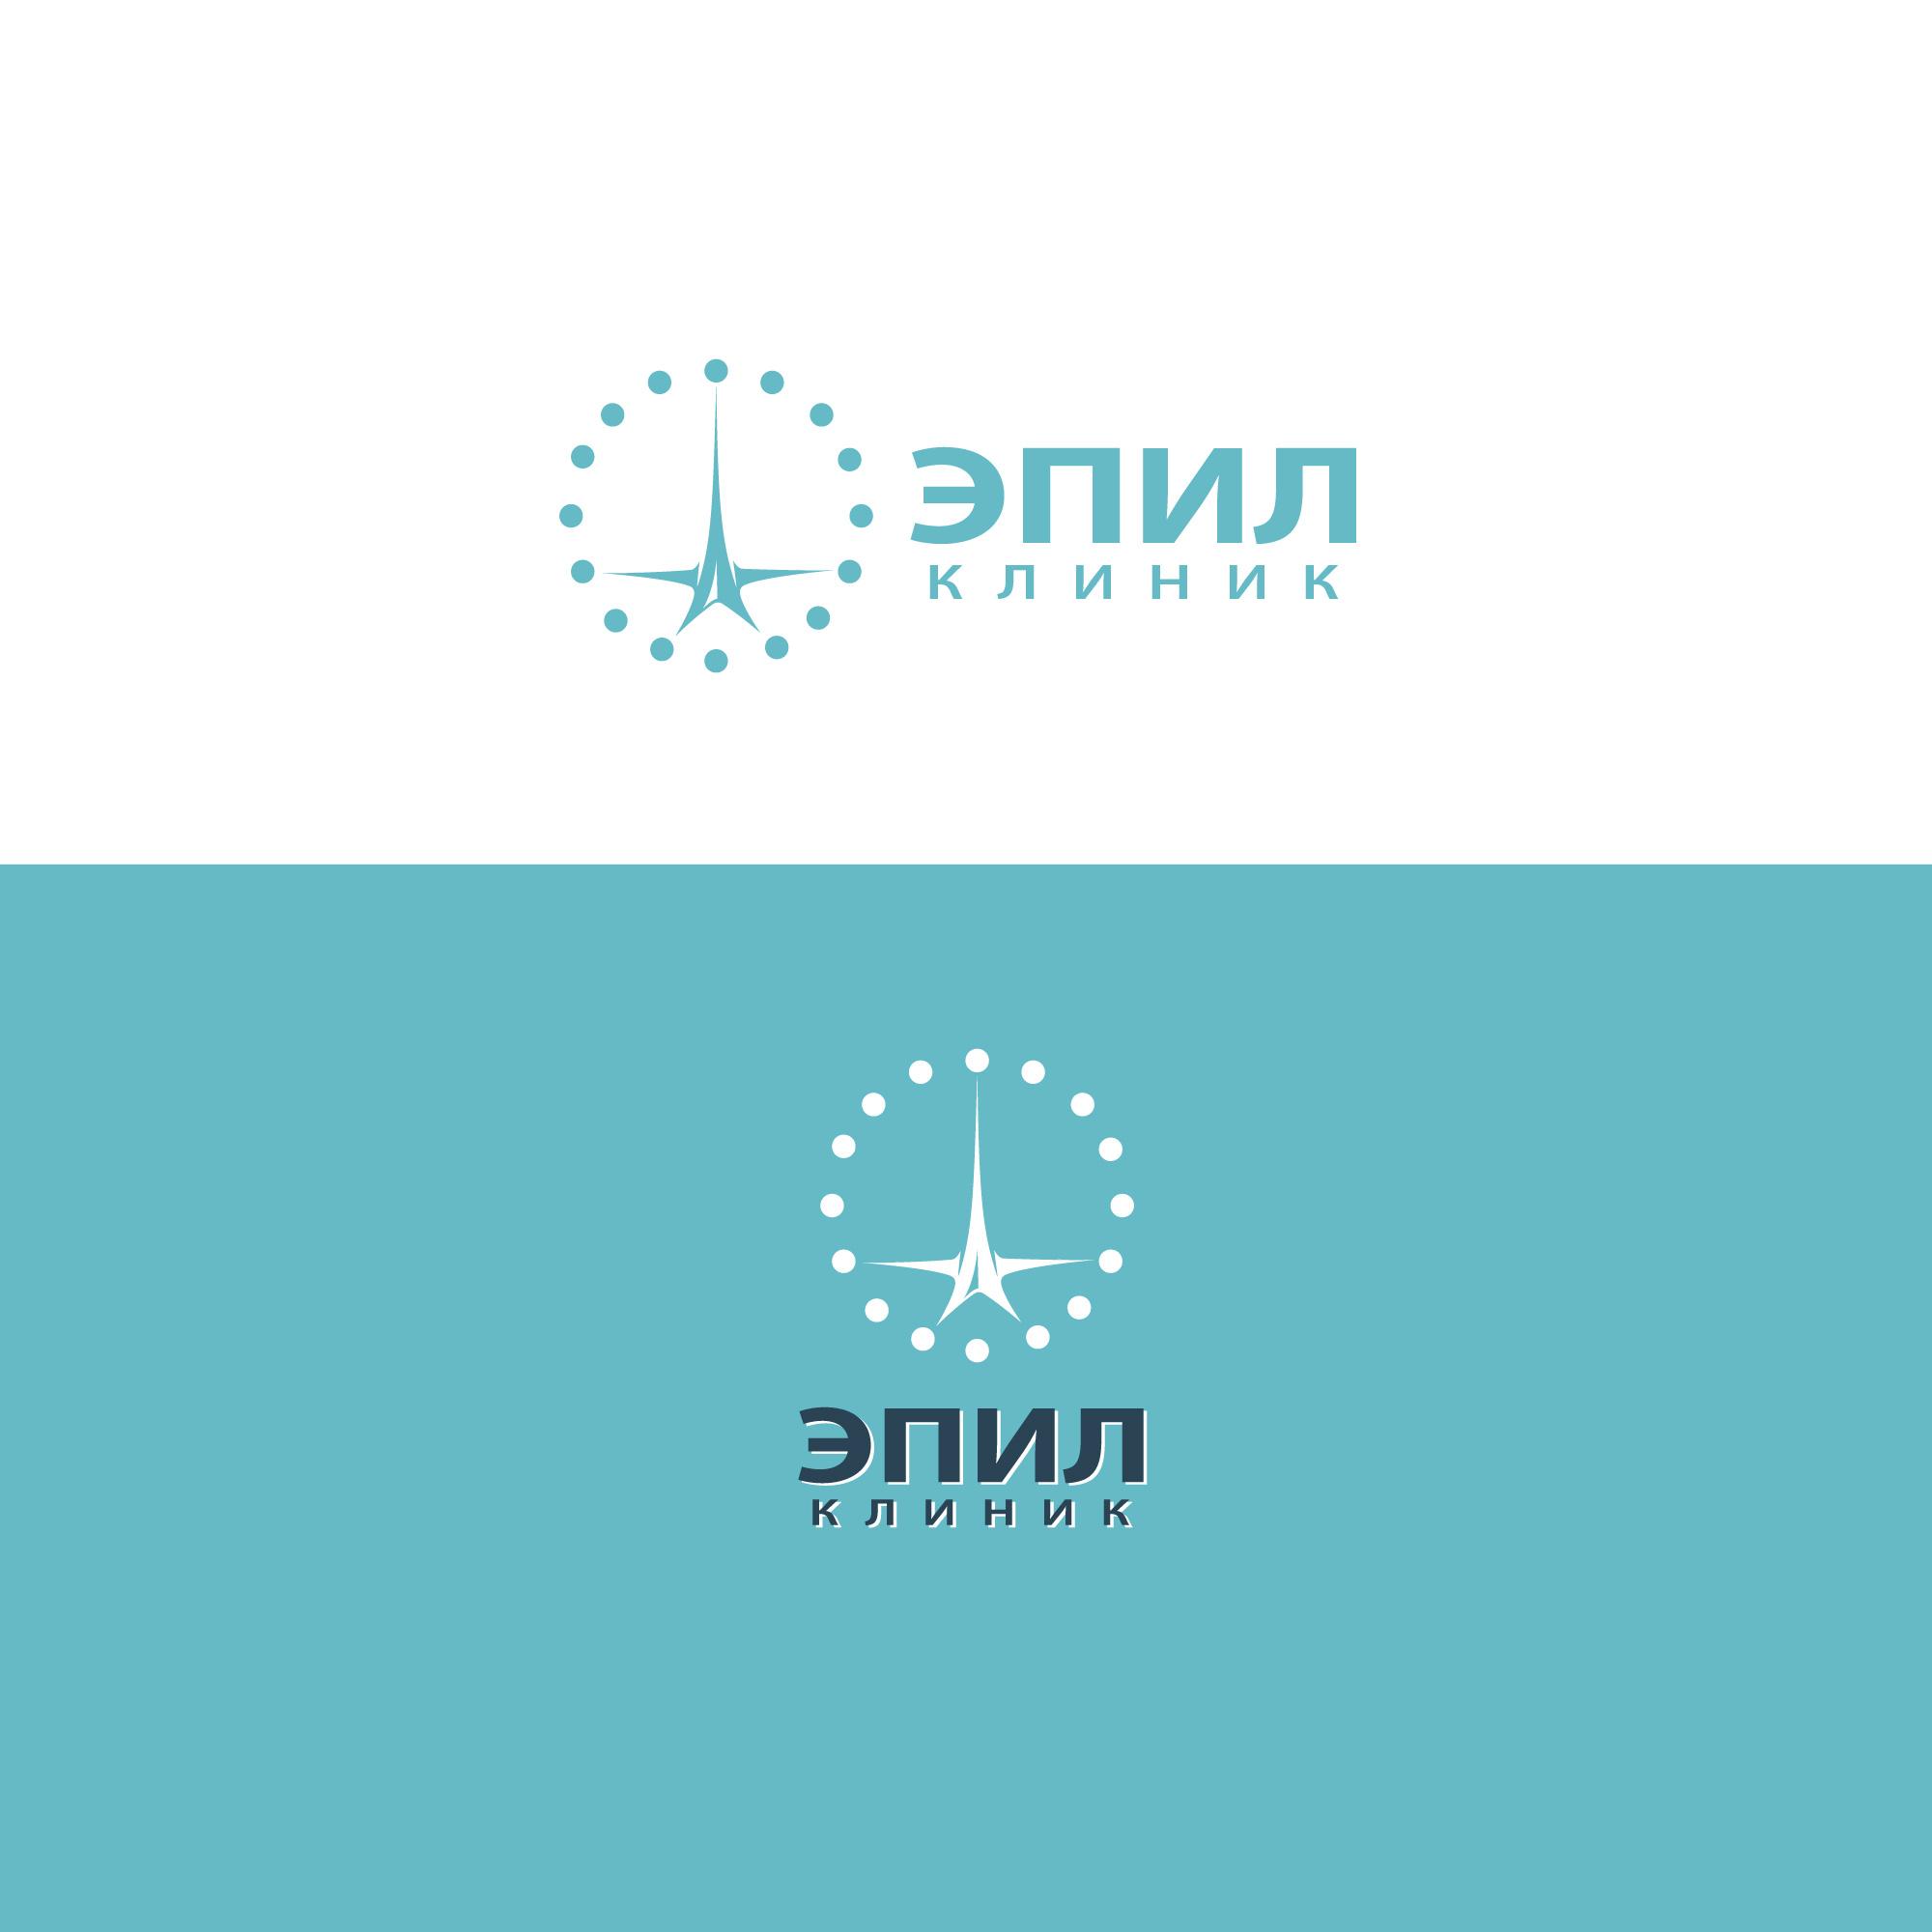 Логотип , фирменный стиль  фото f_7045e1ab6fa16342.jpg